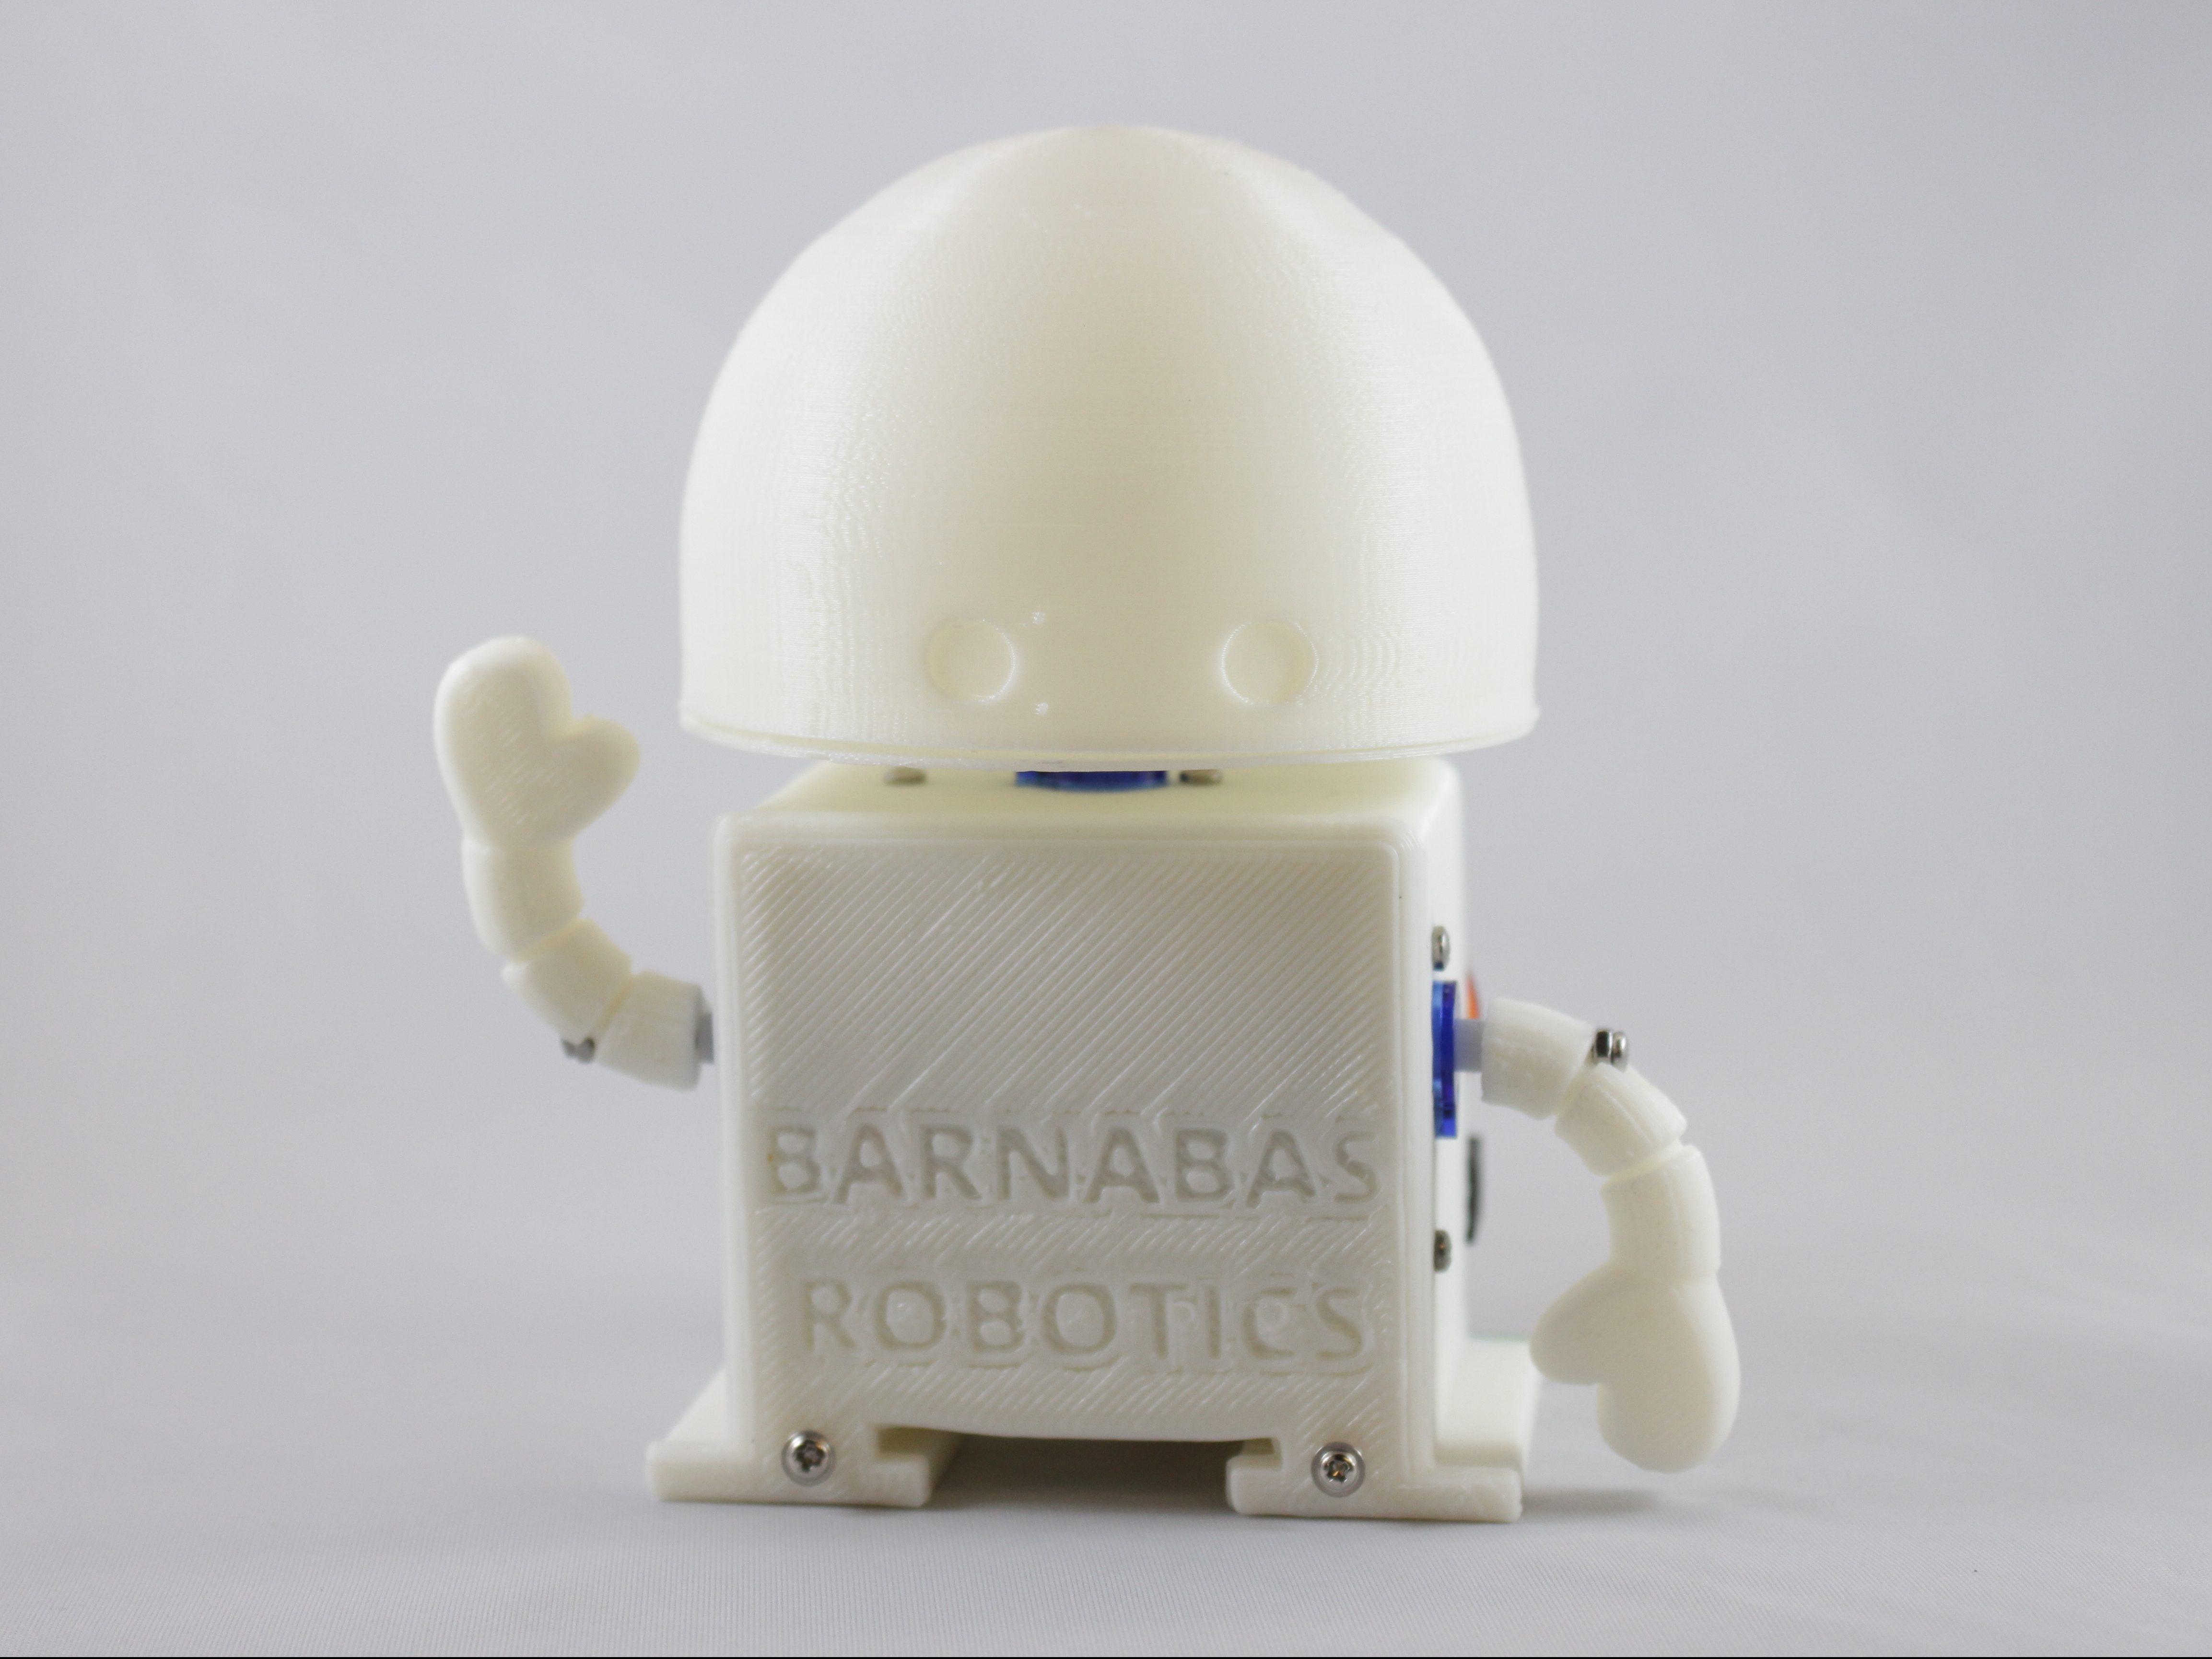 Barnabas-Bot Robotics Kit